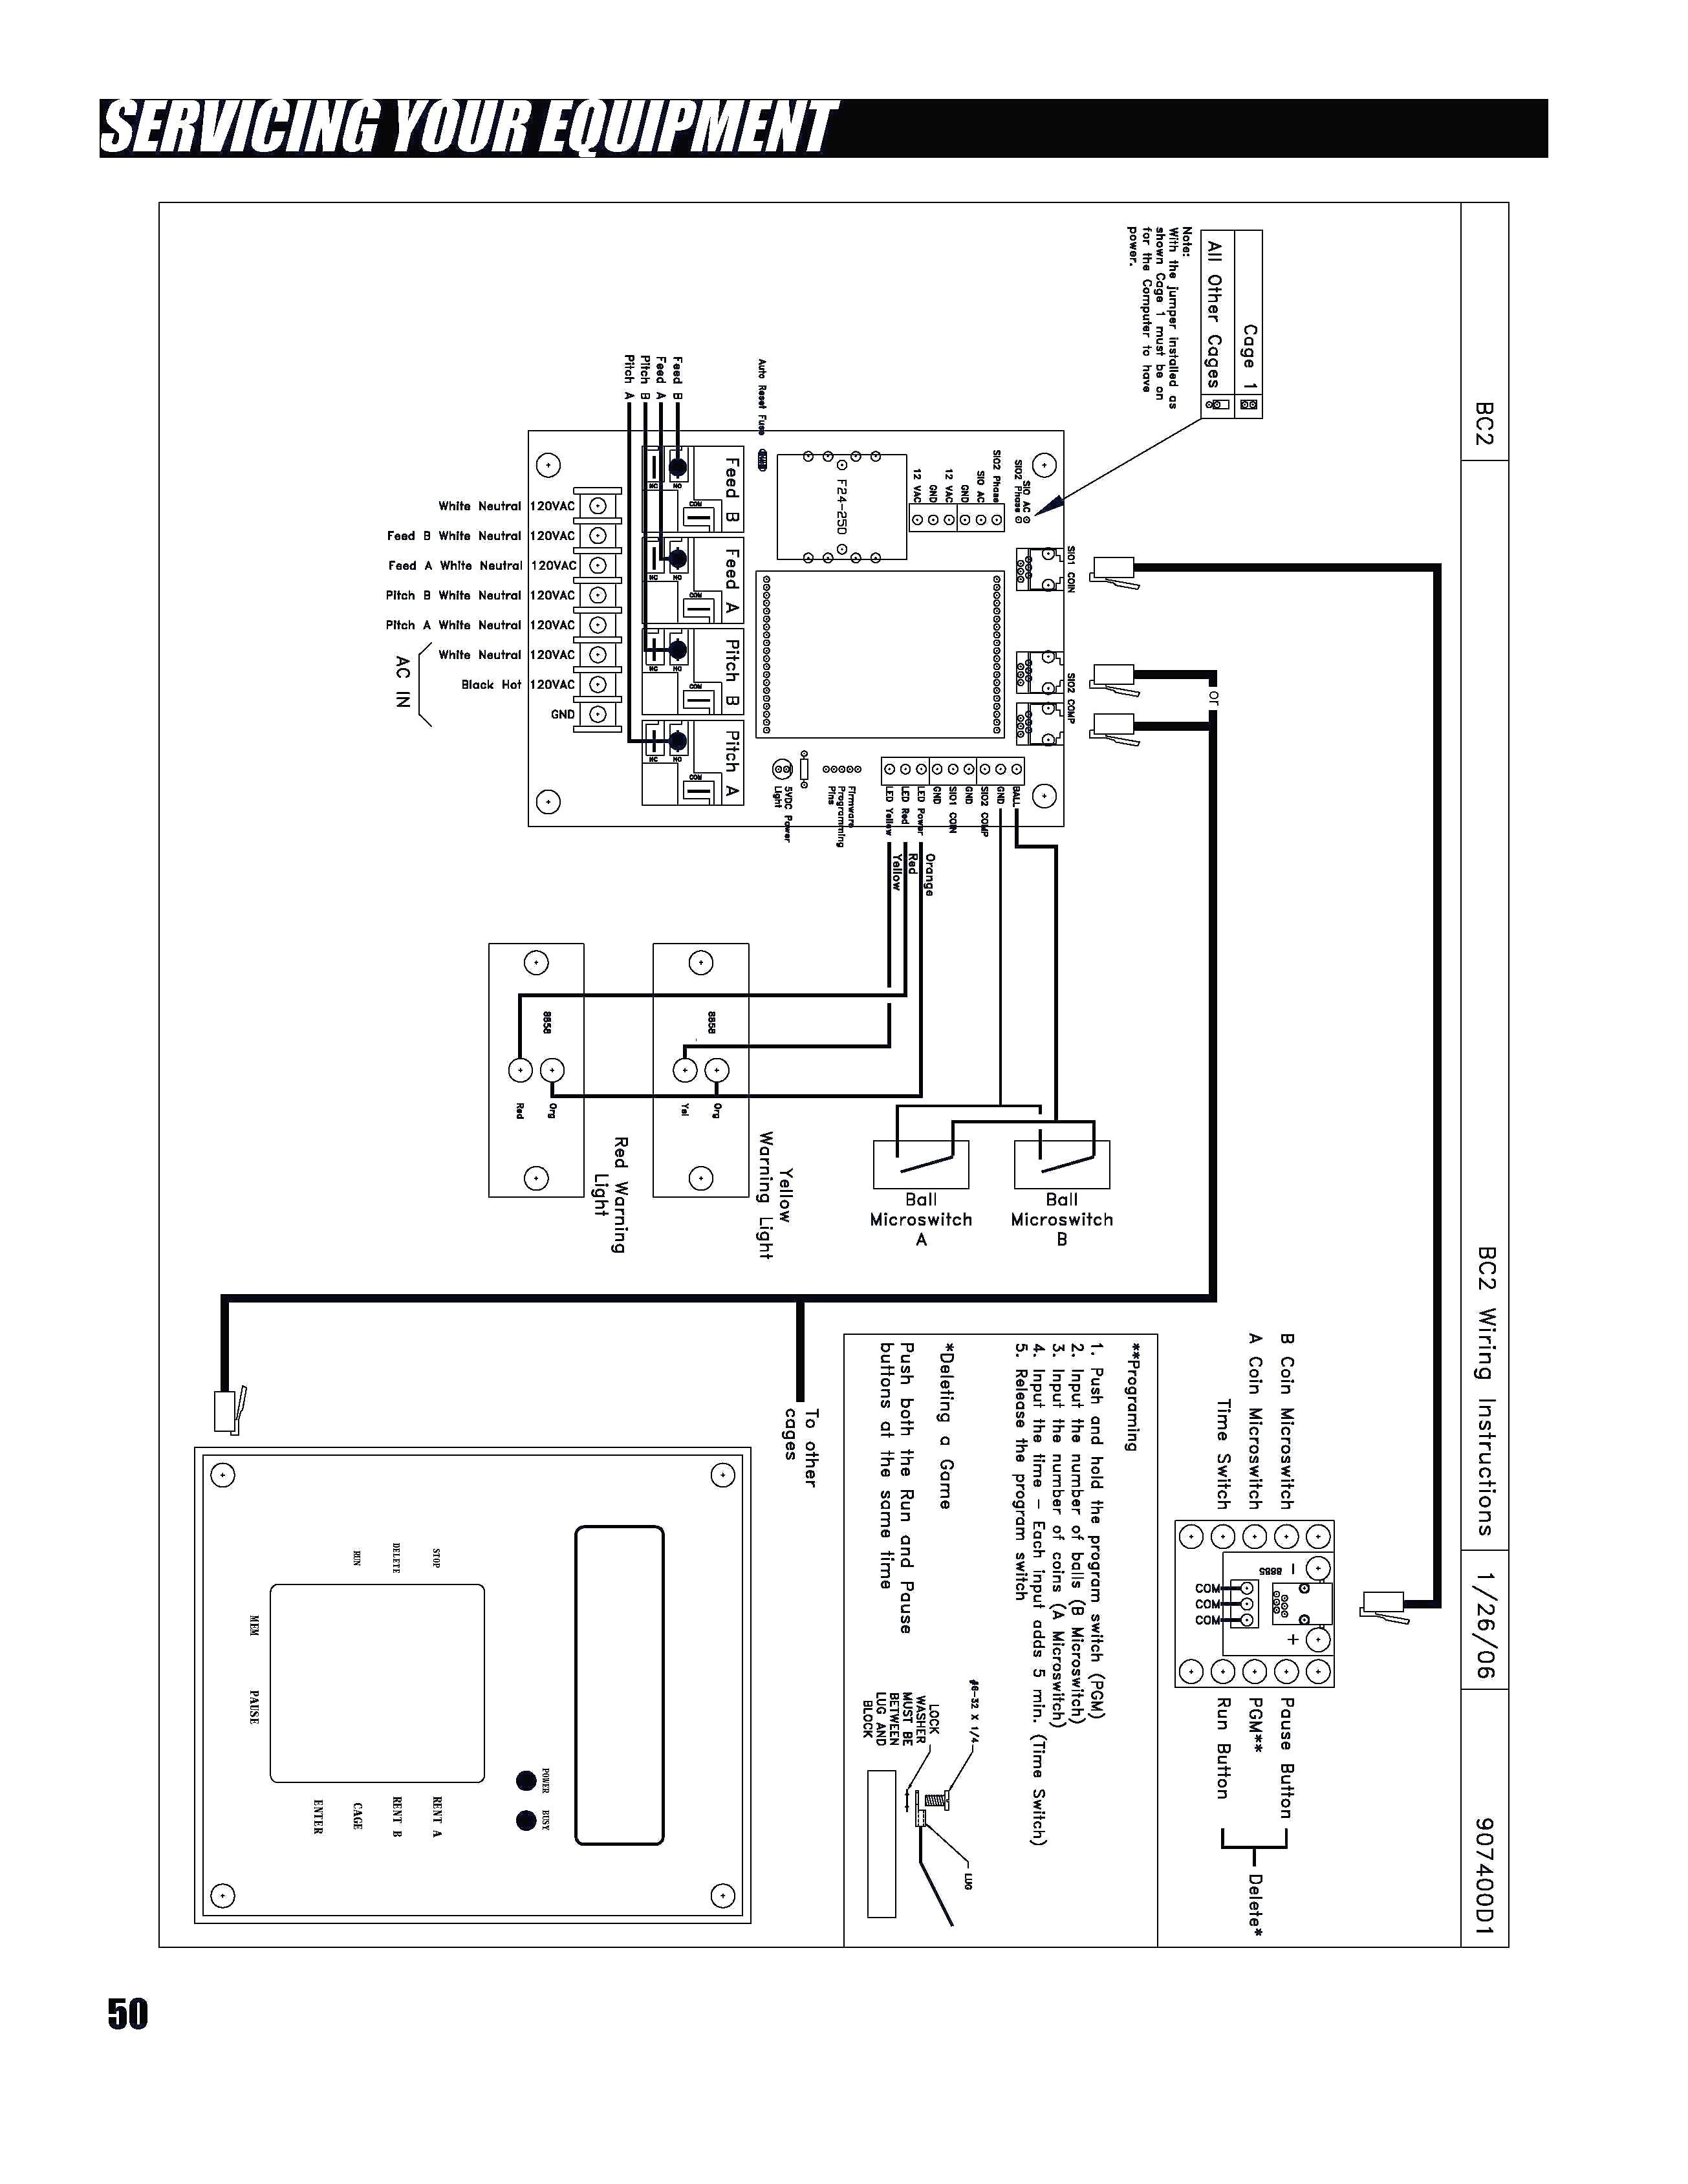 Wiring Diagram Leeson Electric Motor Refrence Dayton Electric Motors Wiring Diagram Beautiful Marathon Motors